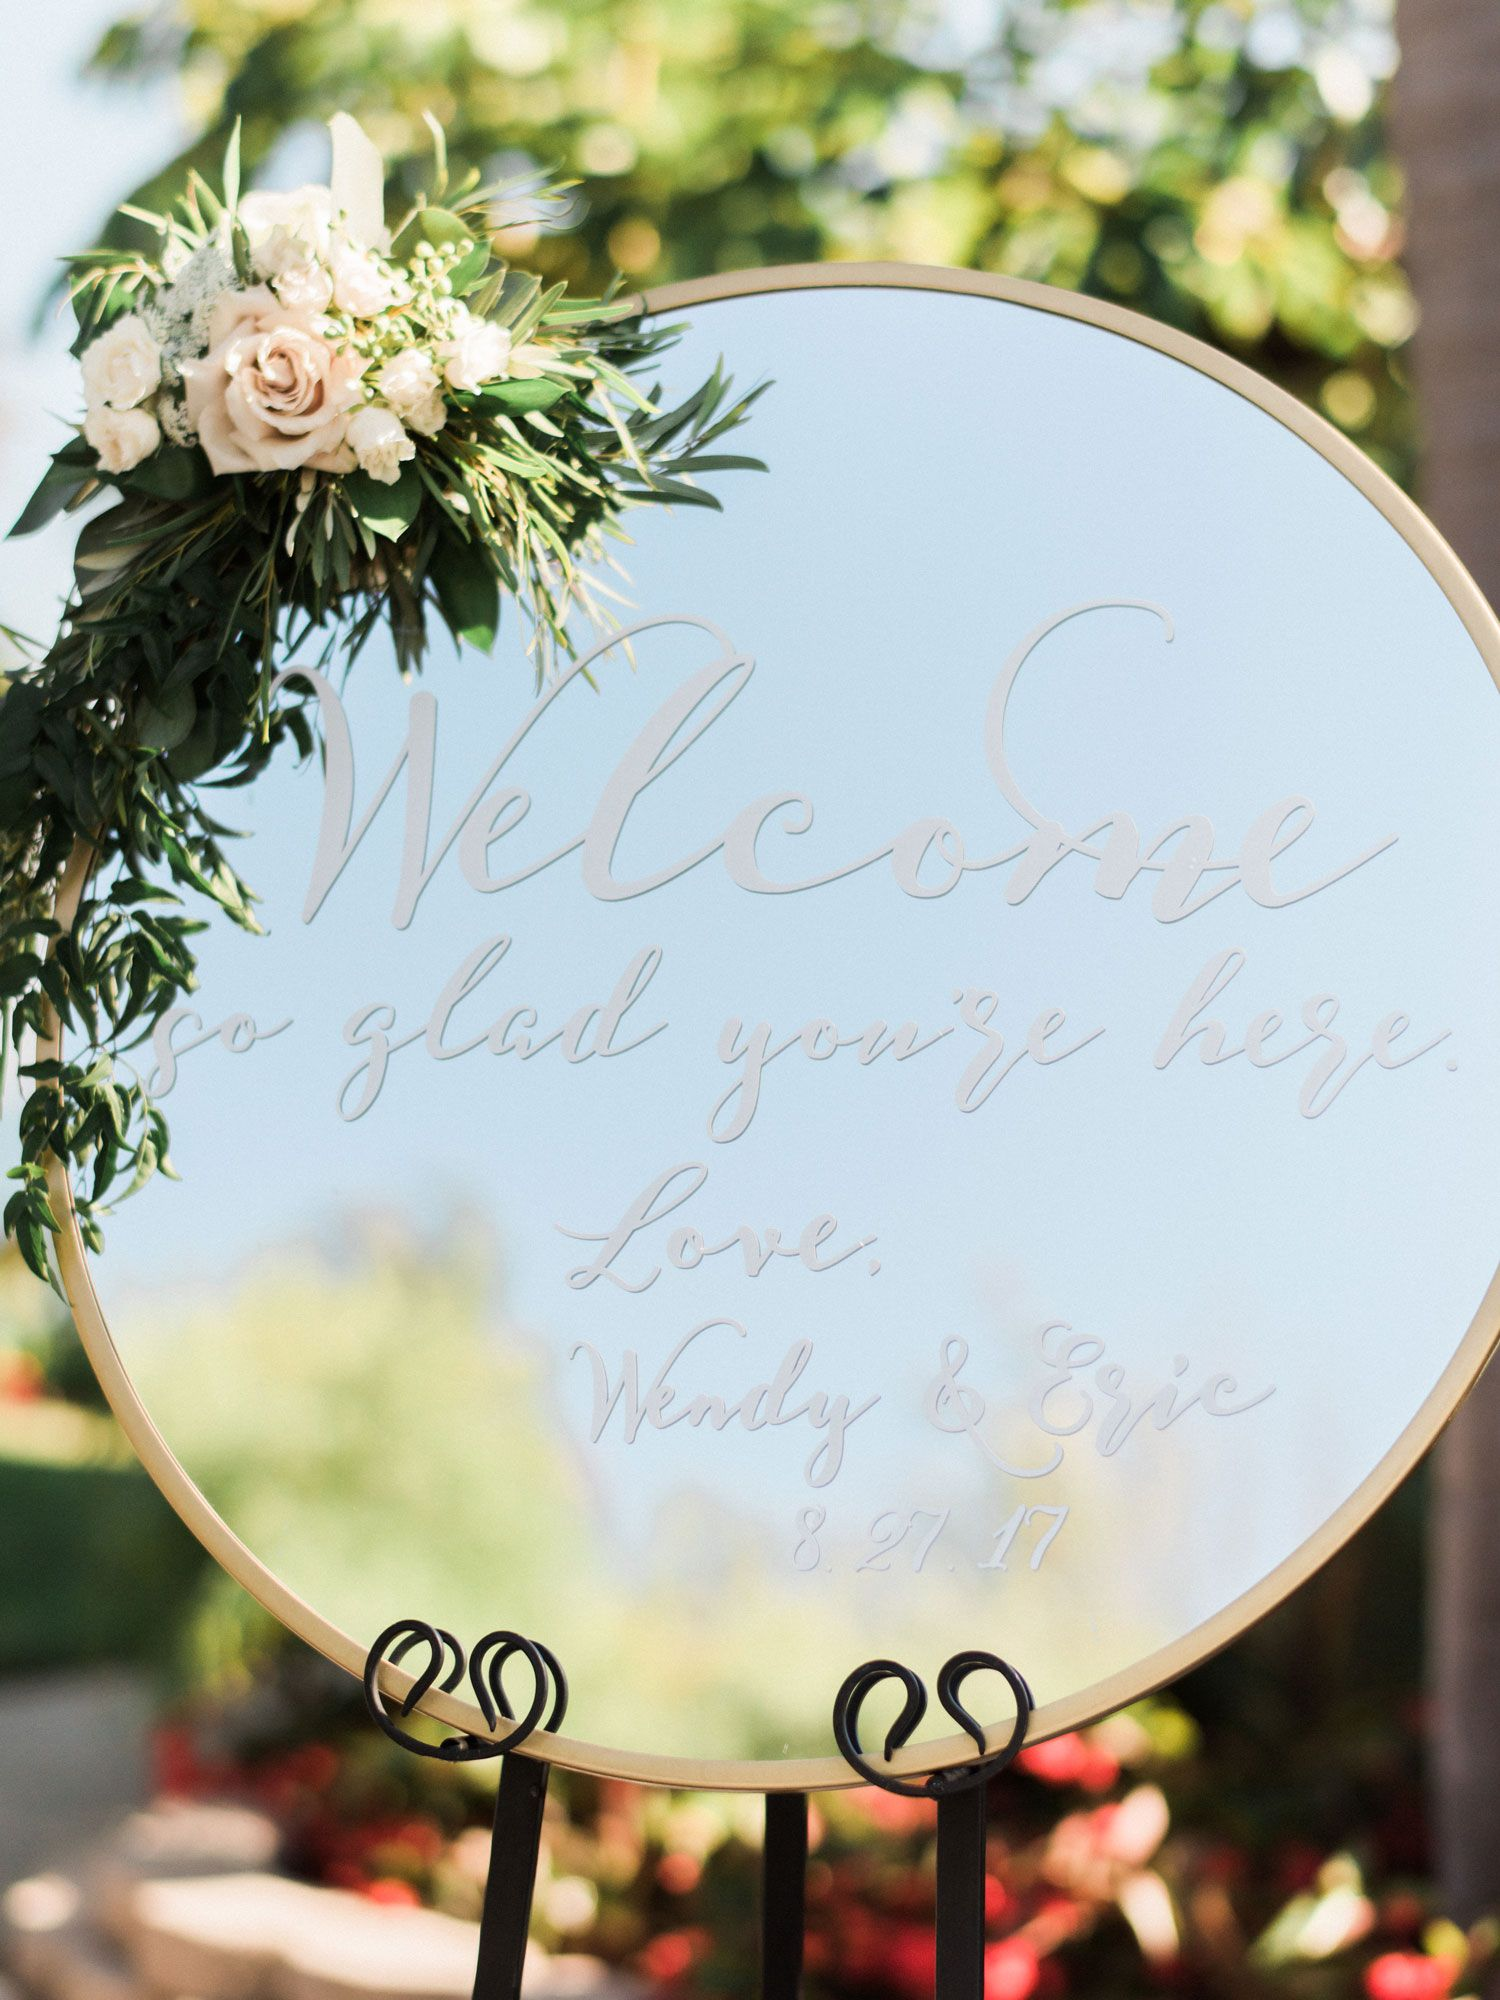 Organic Glam Vintage Inspired Real Wedding In California Inside Weddings Mirror Wedding Signs Wedding Welcome Signs Wedding Welcome Board